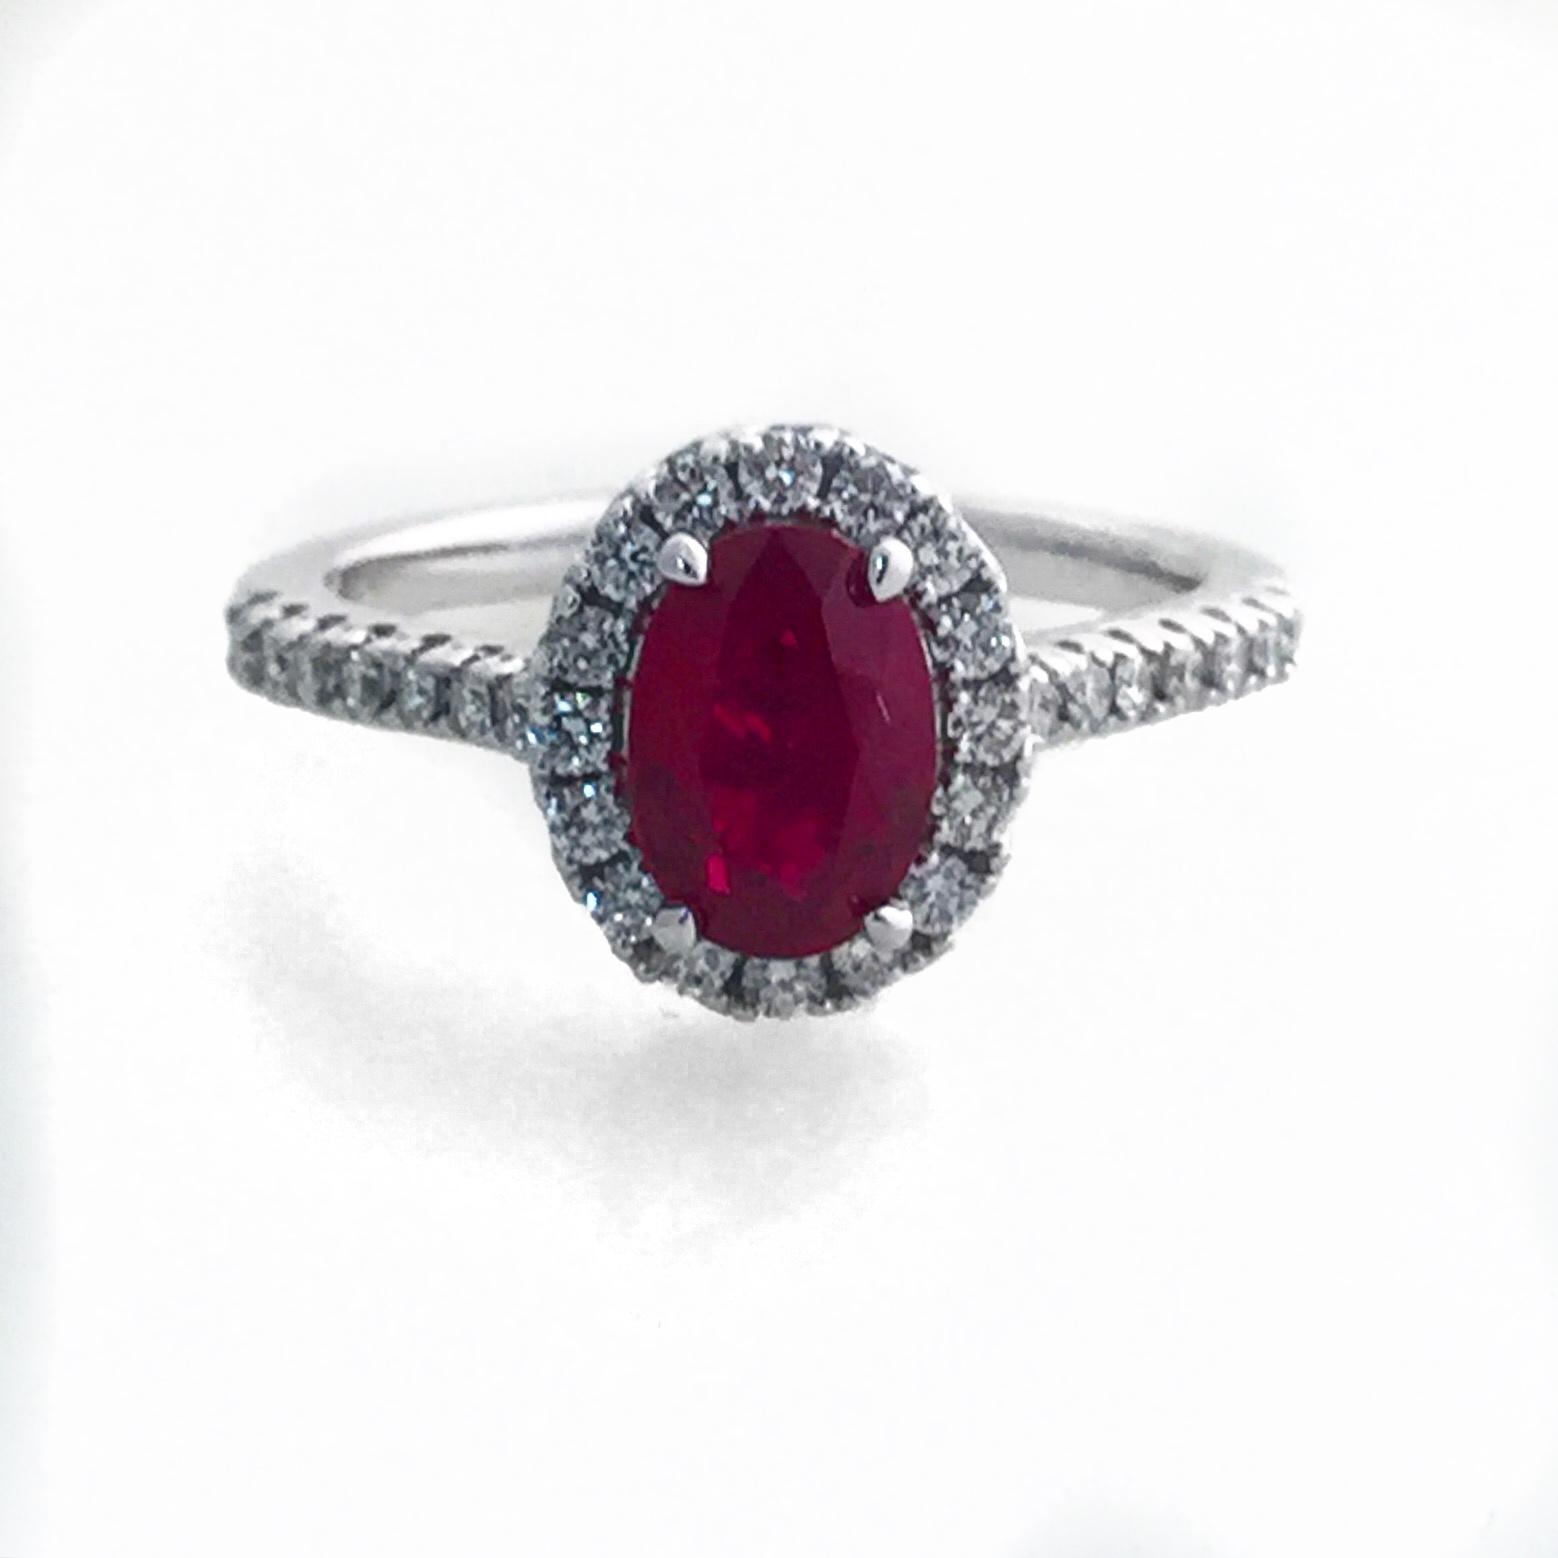 Platinum Halo Diamond ring with Ruby Center.  Available with any precious or semi precious stone.